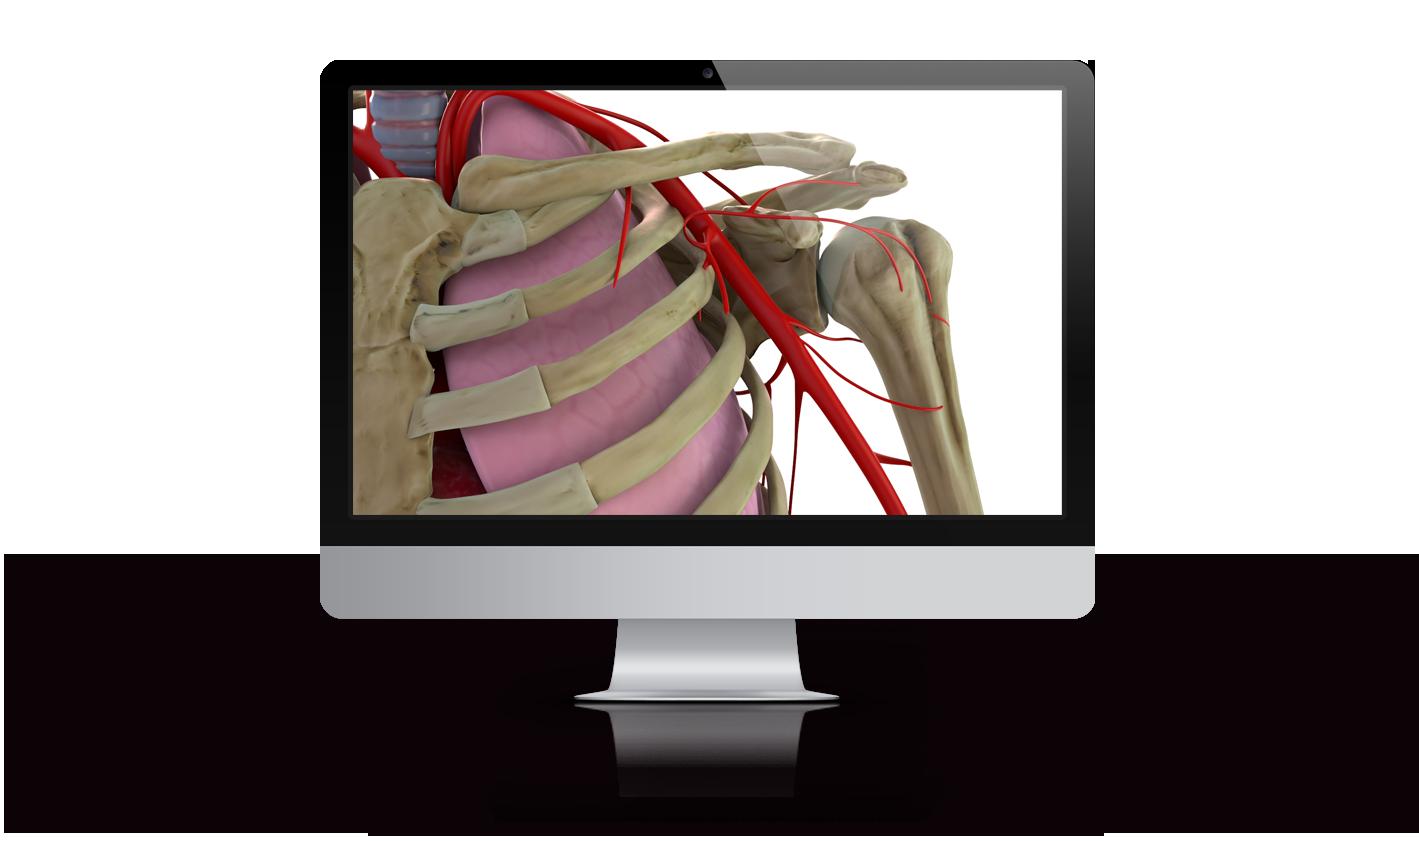 Banco de imagen médica 3D hombro